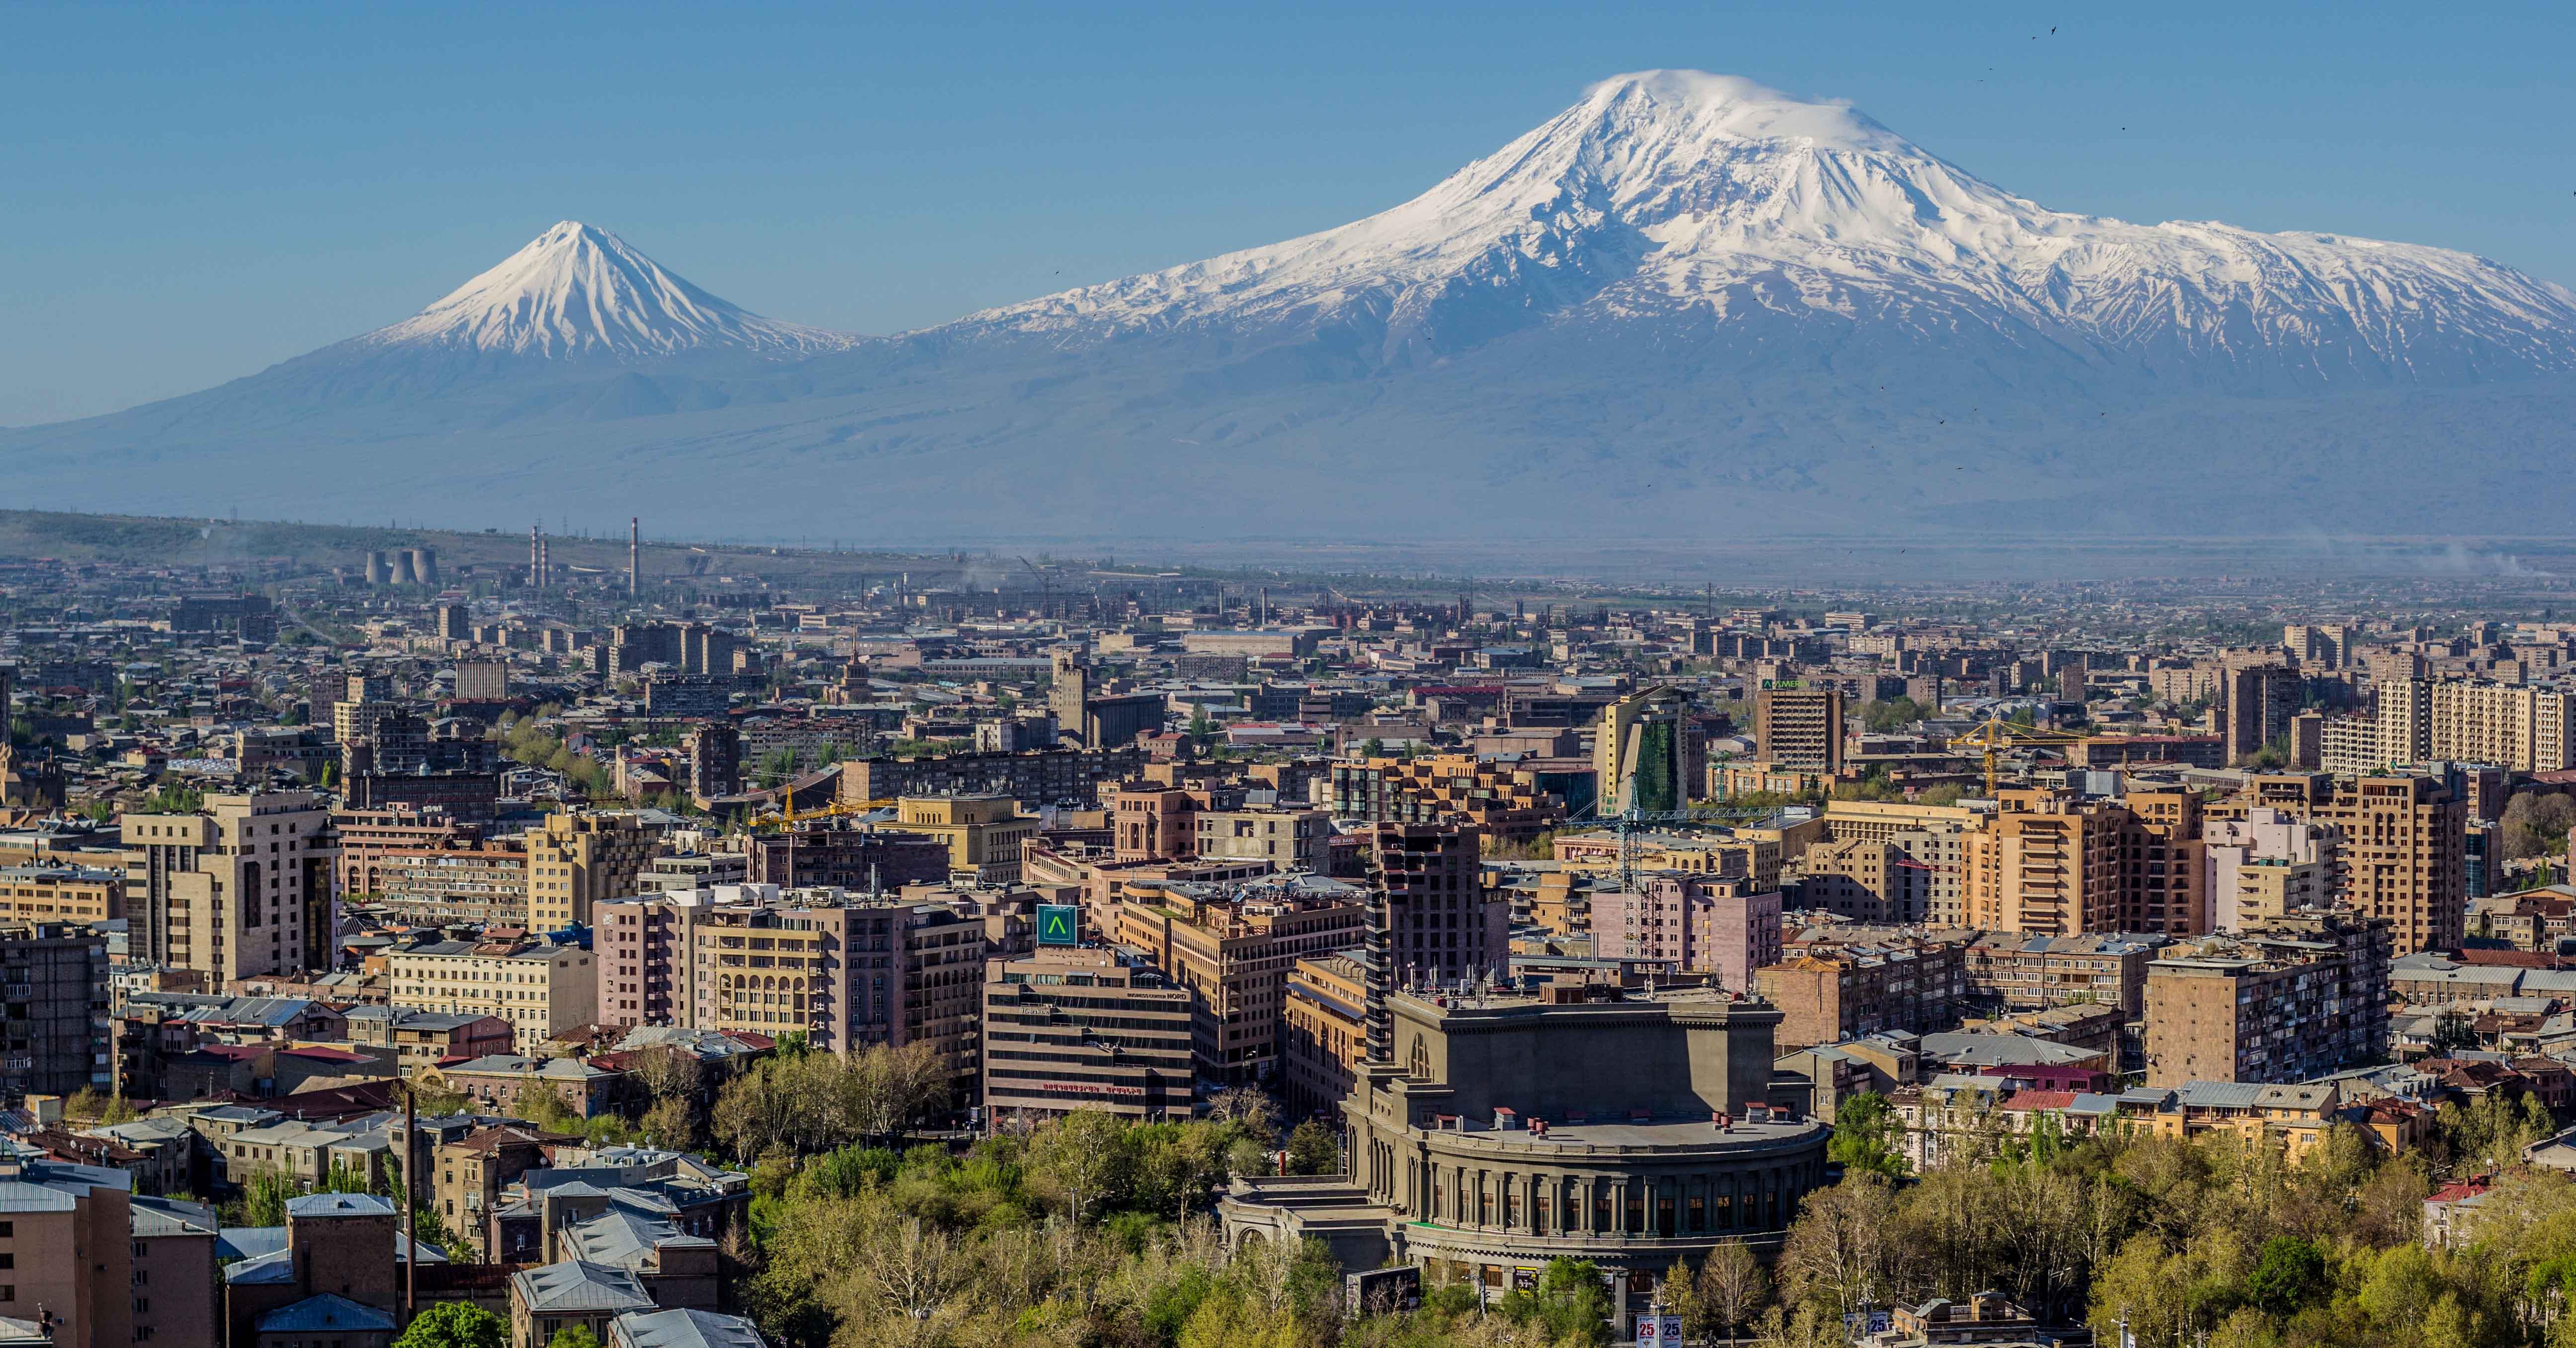 mount_ararat_and_the_yerevan_skyline.jpg